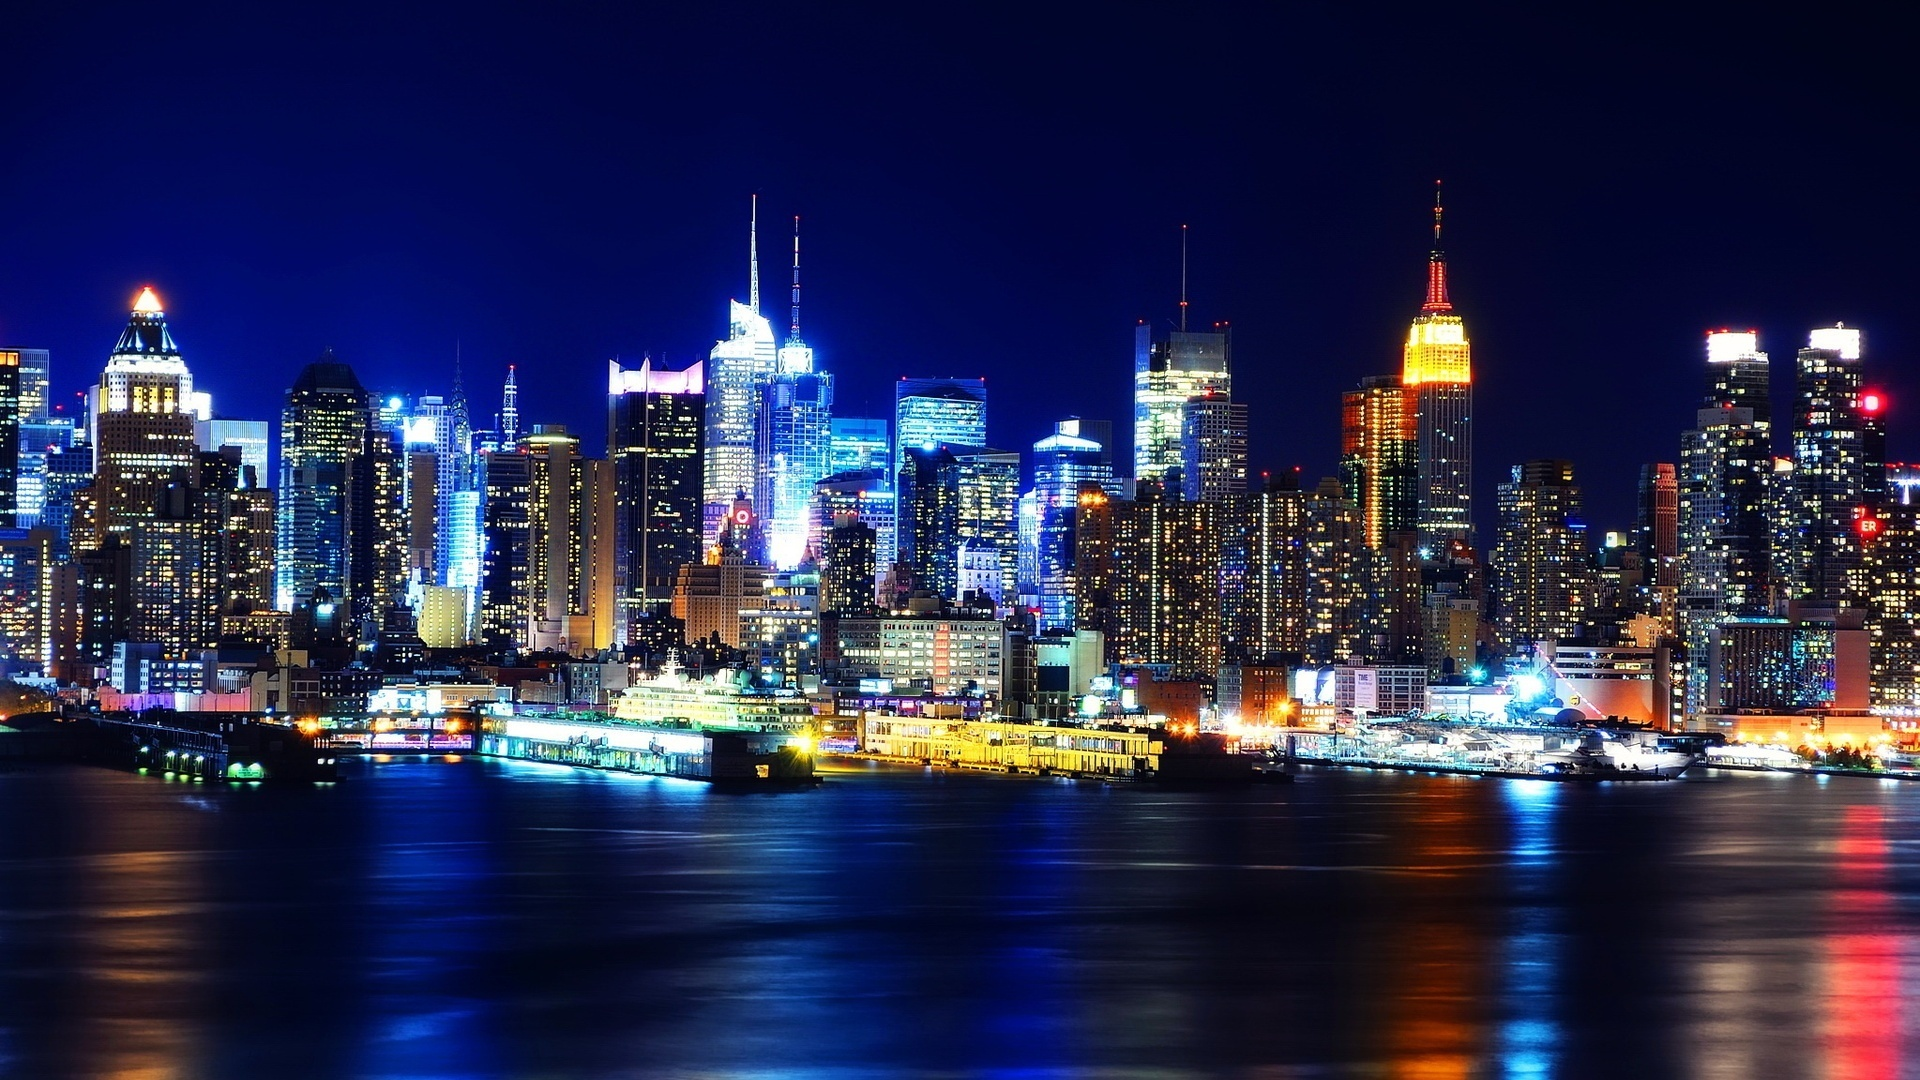 Sharing New York City Night Lights HD Wallpapers Wallpaper 1920x1080